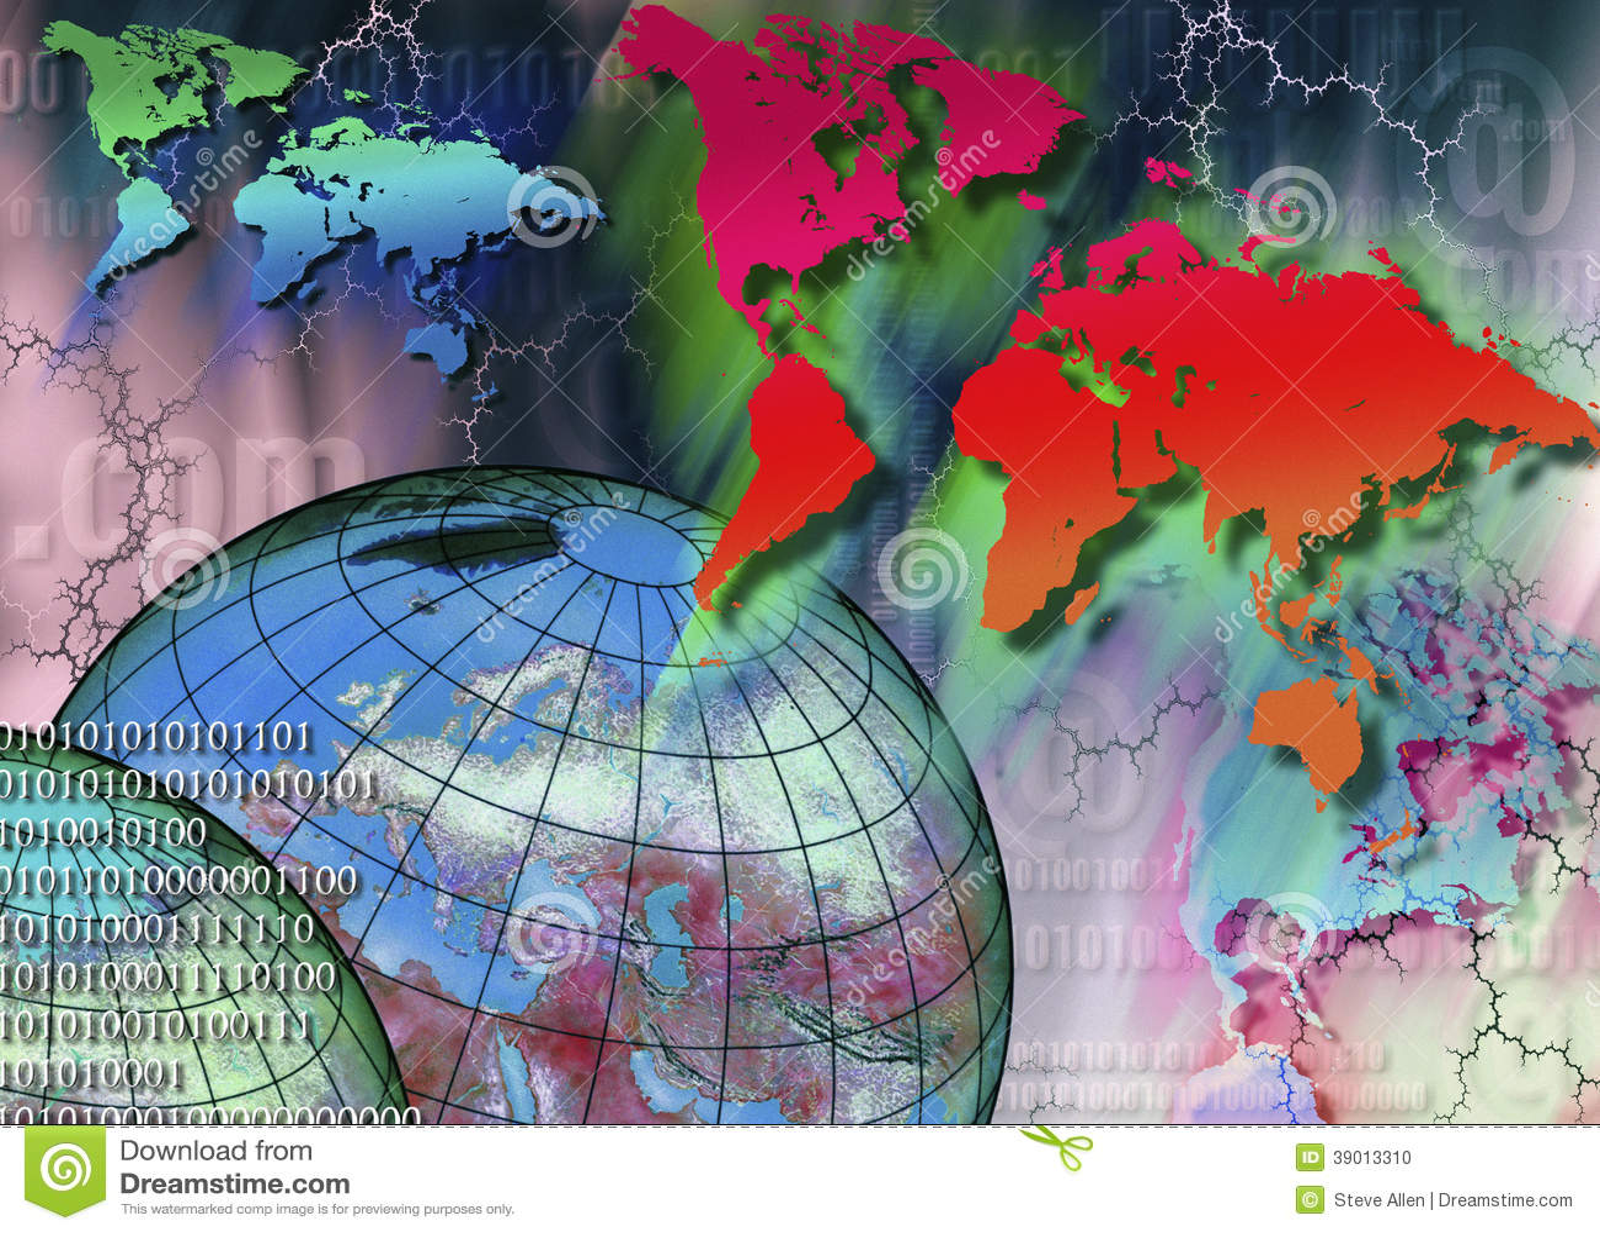 No mundo inteiro - Internet - Cyberspace